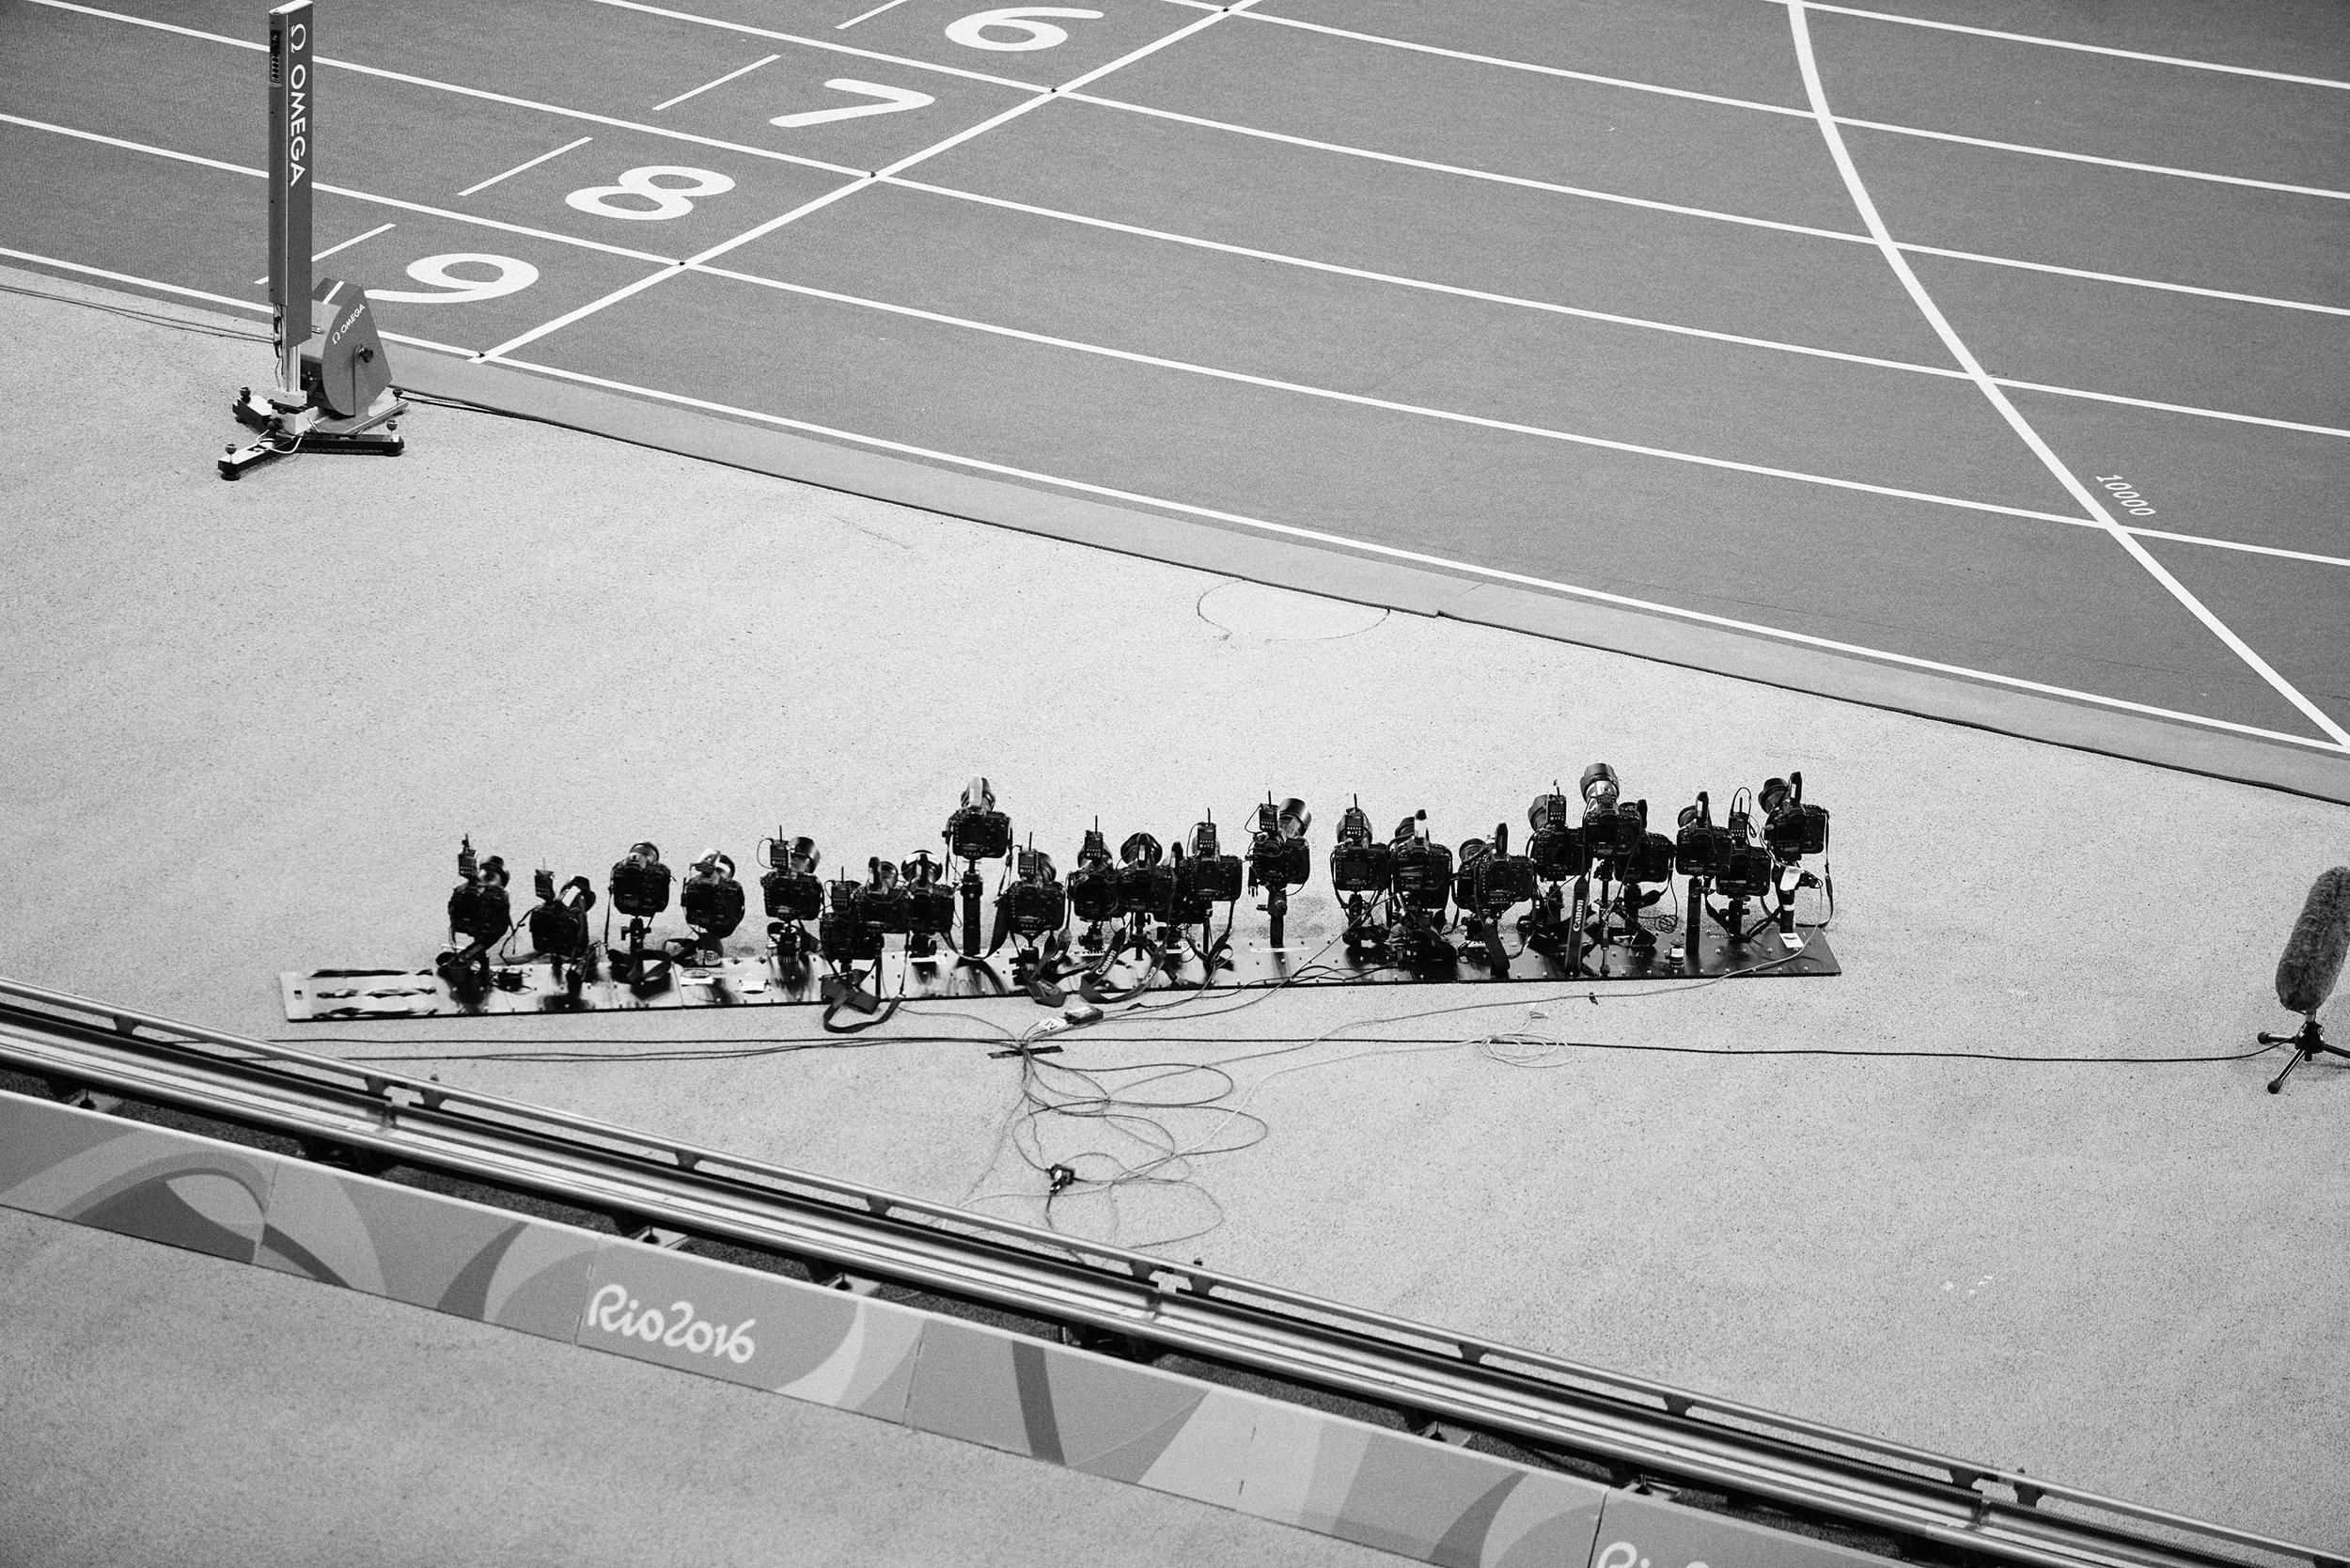 Stockdale_Olympics11.jpg